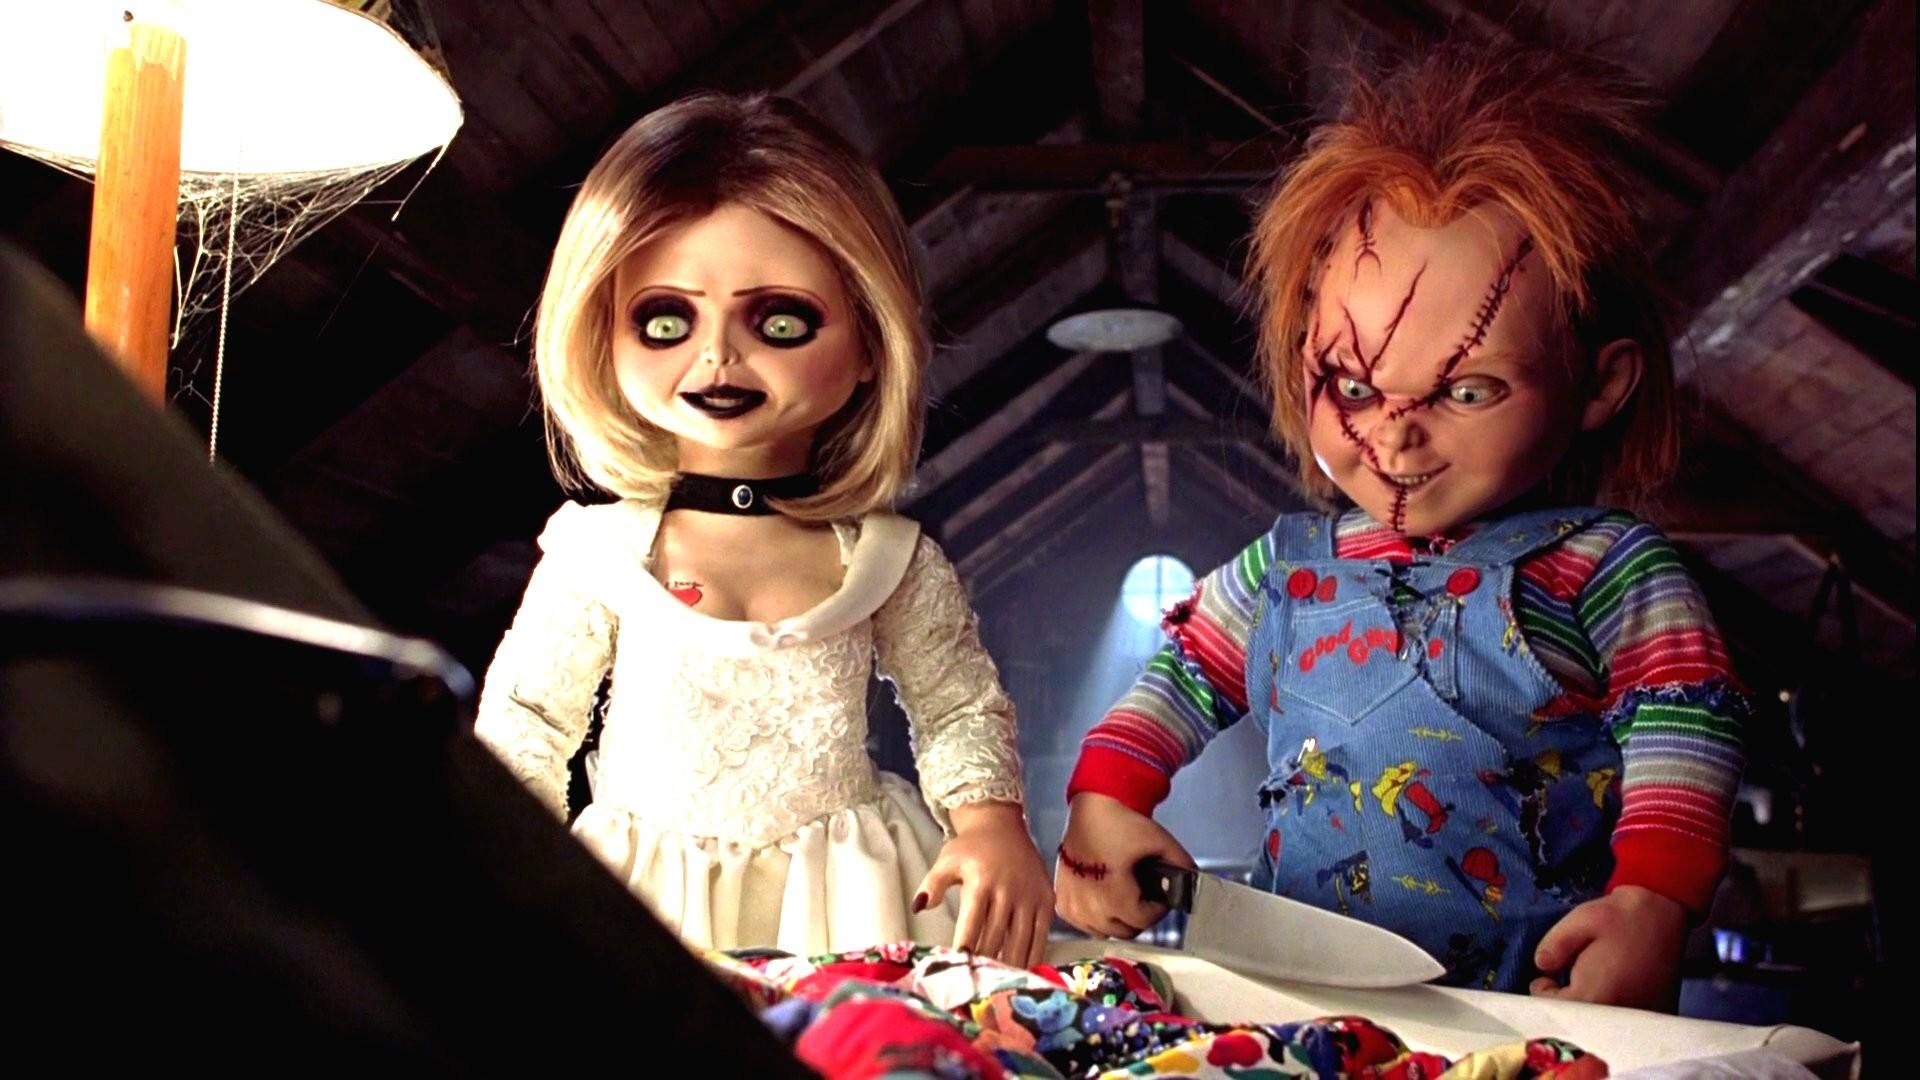 CHILDS PLAY chucky dark horror creepy scary (4) wallpaper      235494   WallpaperUP